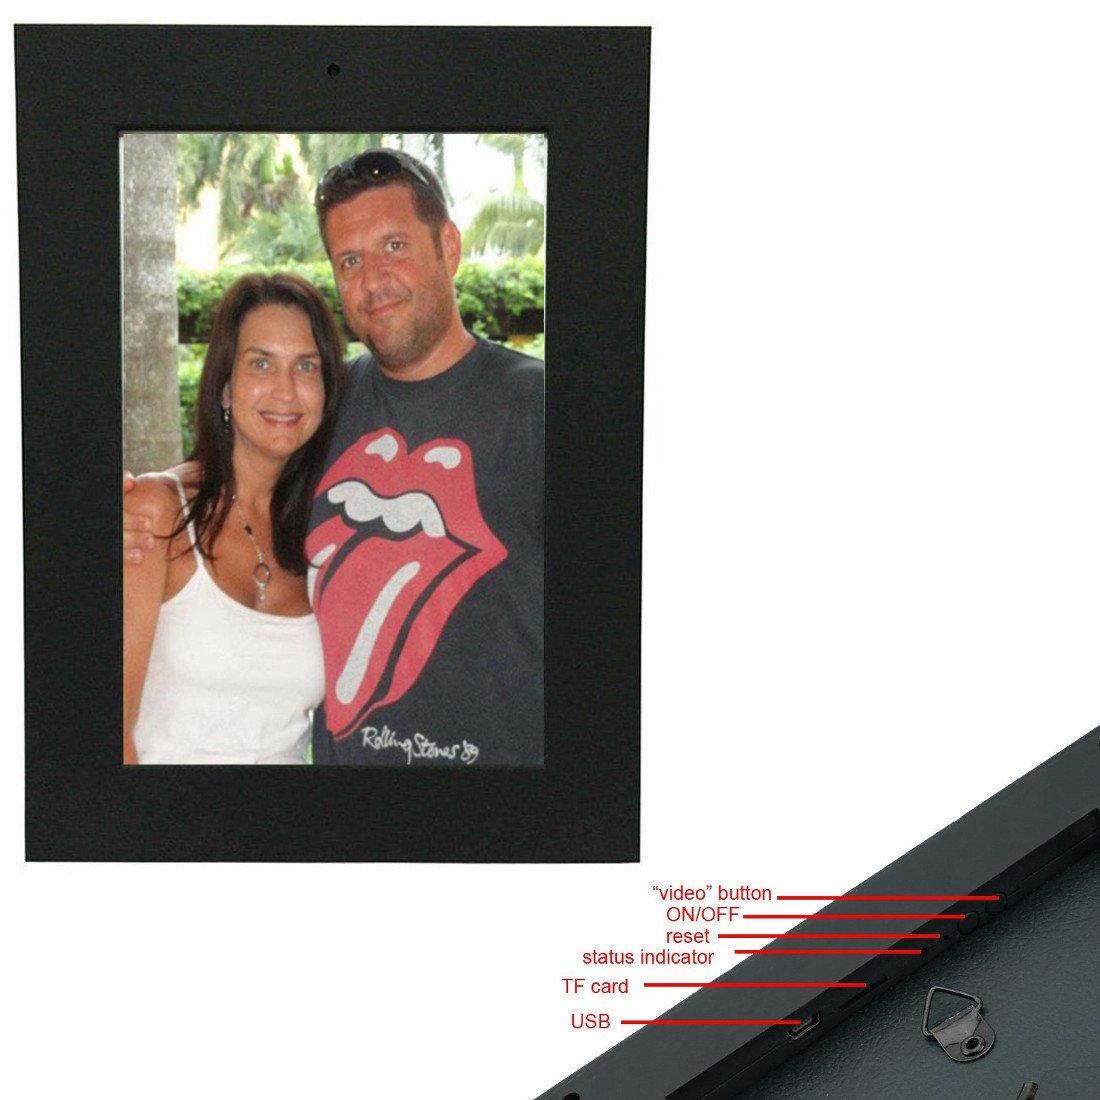 Texet DPV-113 Digital Photo Frame 64 BIT Driver